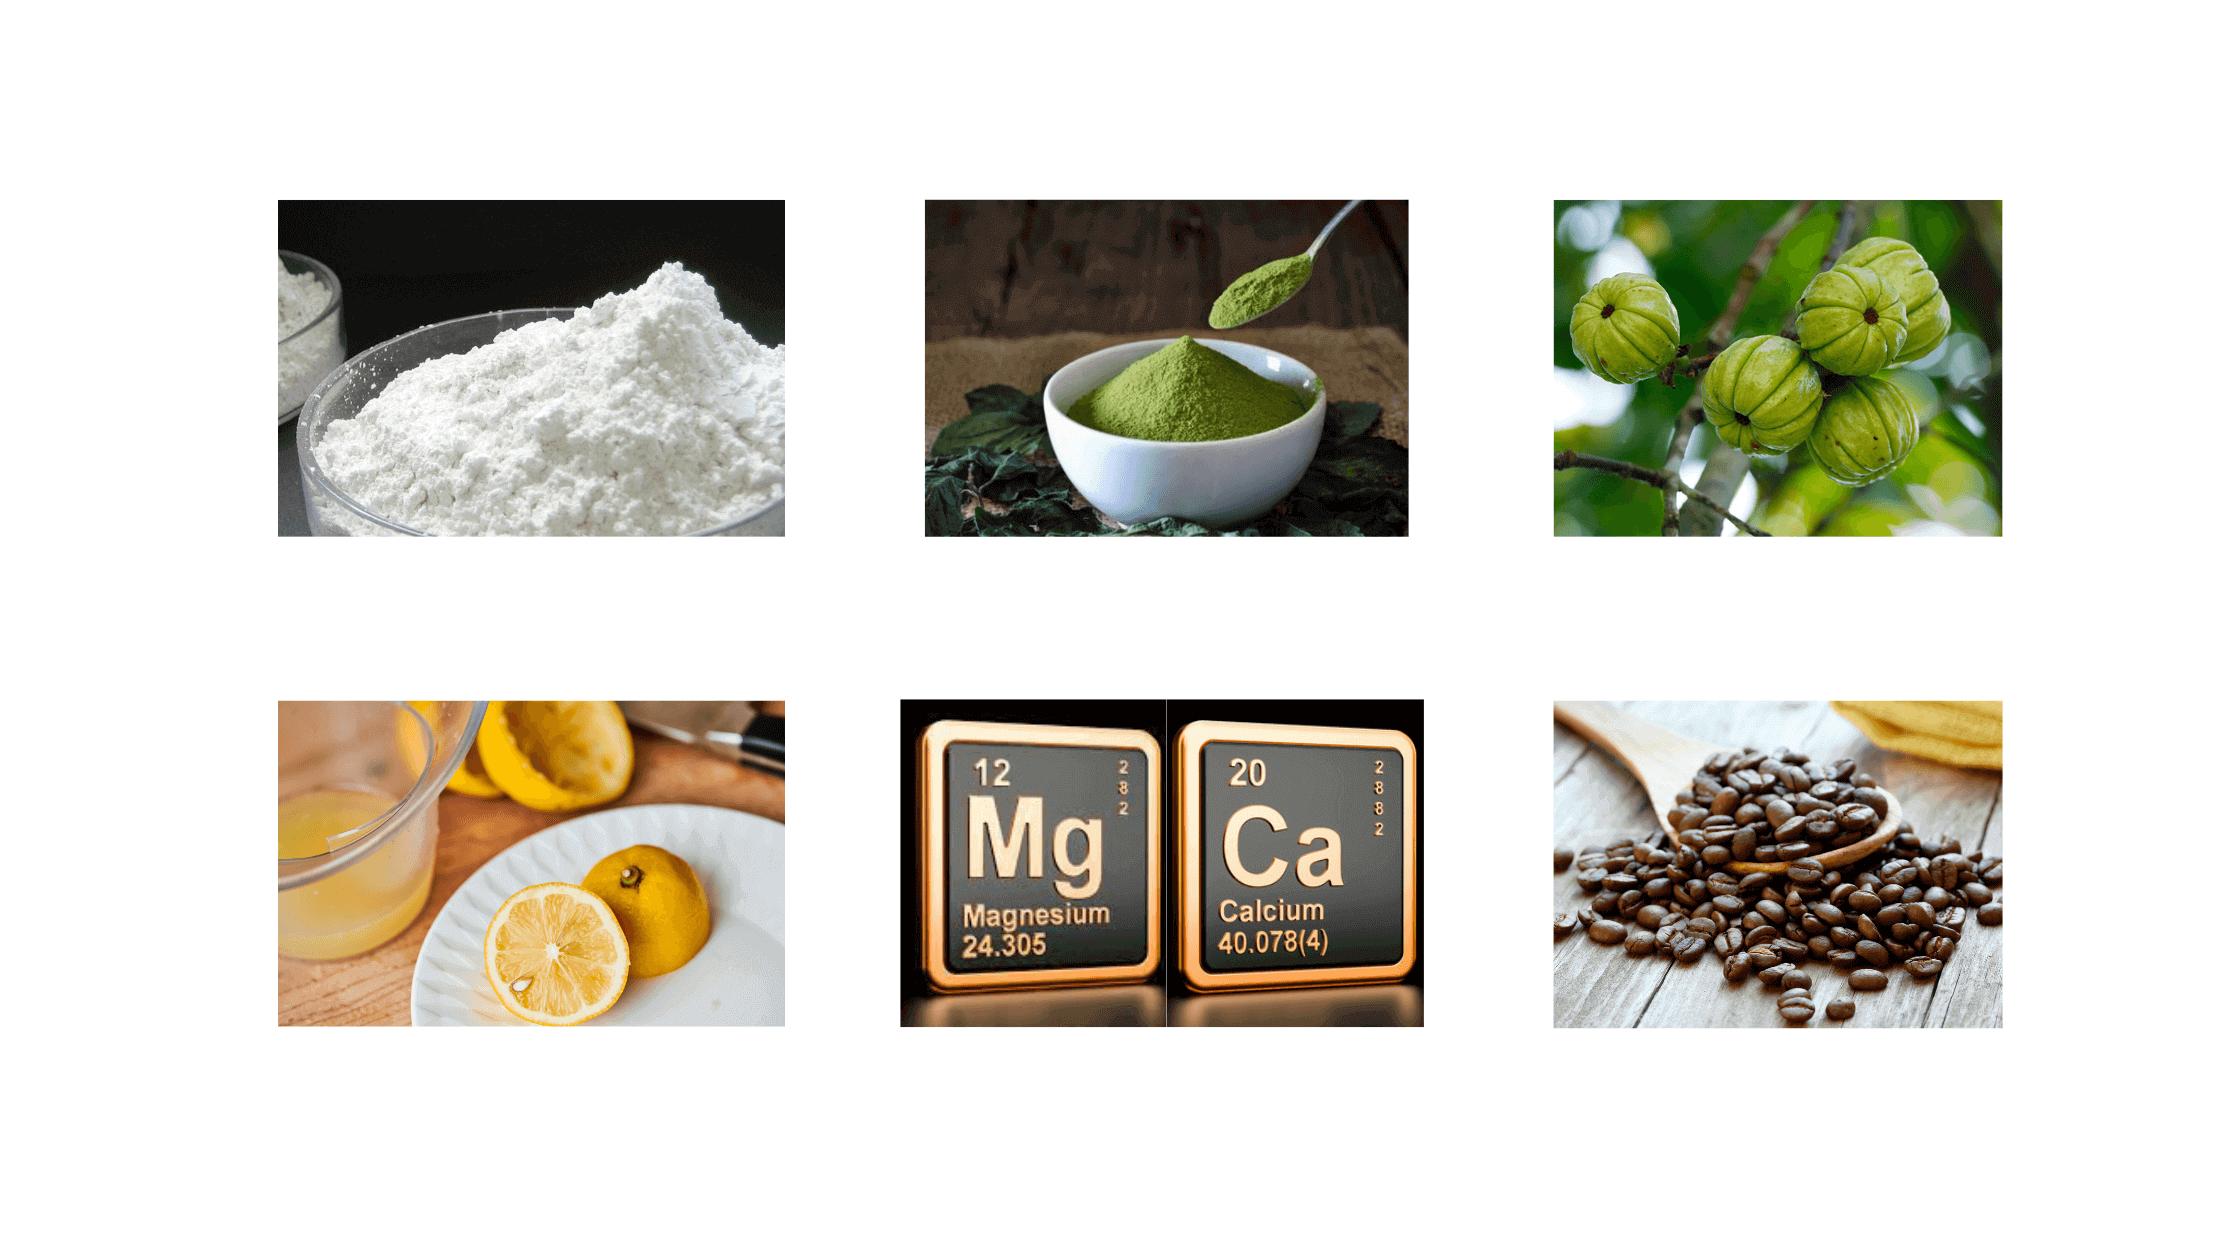 Keto Detox Ingredients